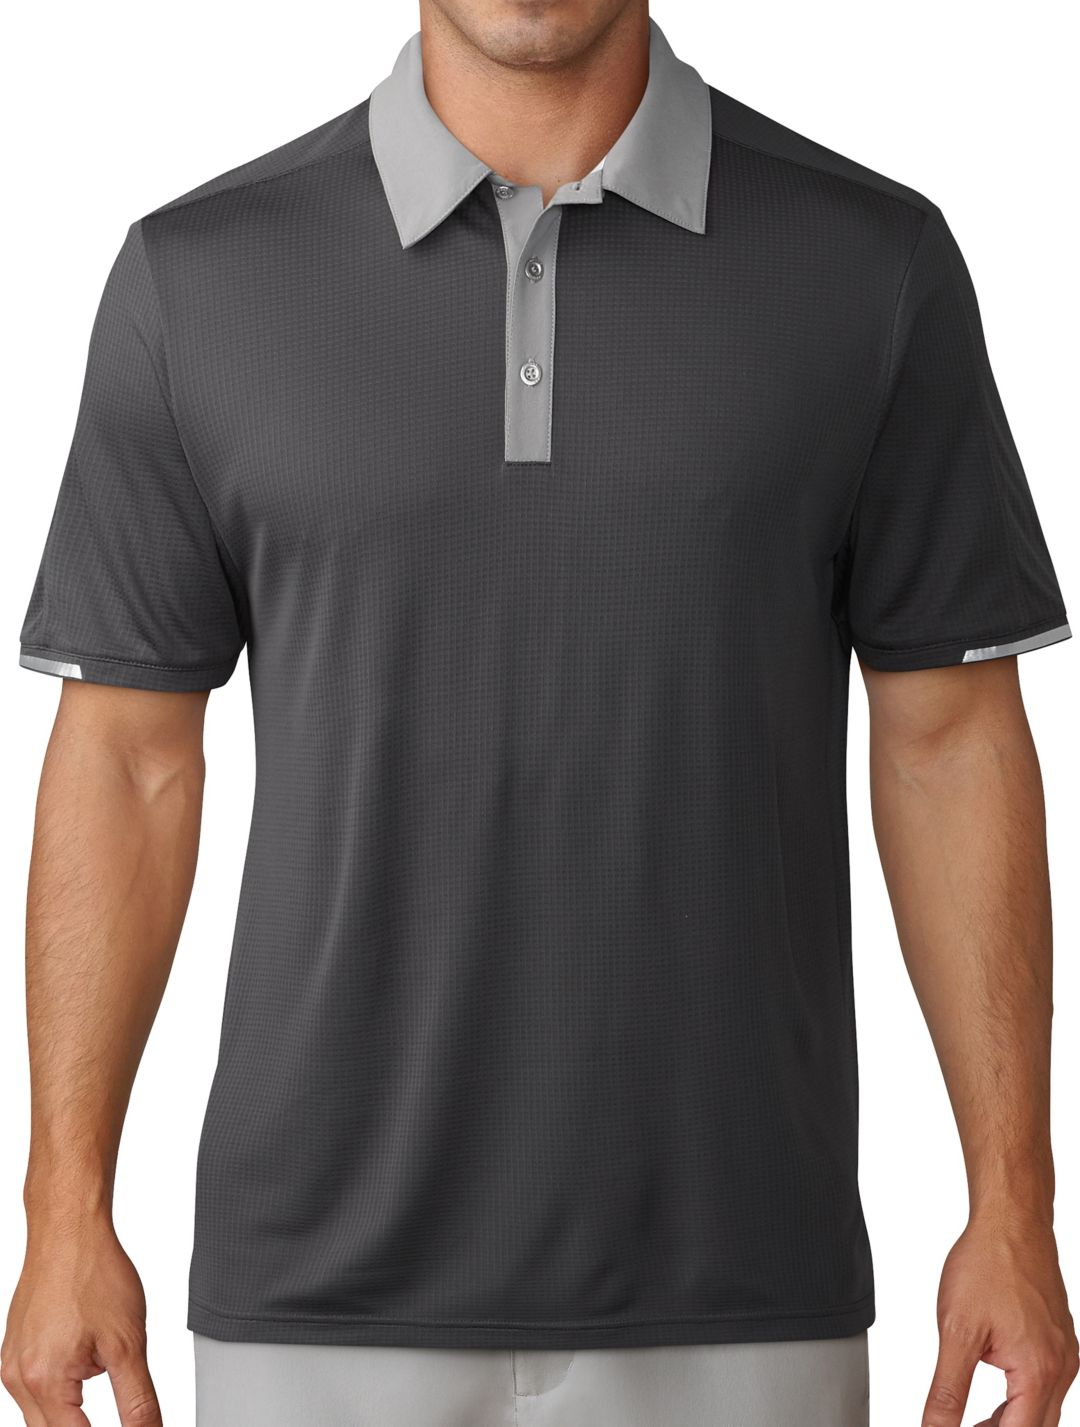 5c3f1cb847e6 adidas Men's climachill Iconic Golf Polo | DICK'S Sporting Goods